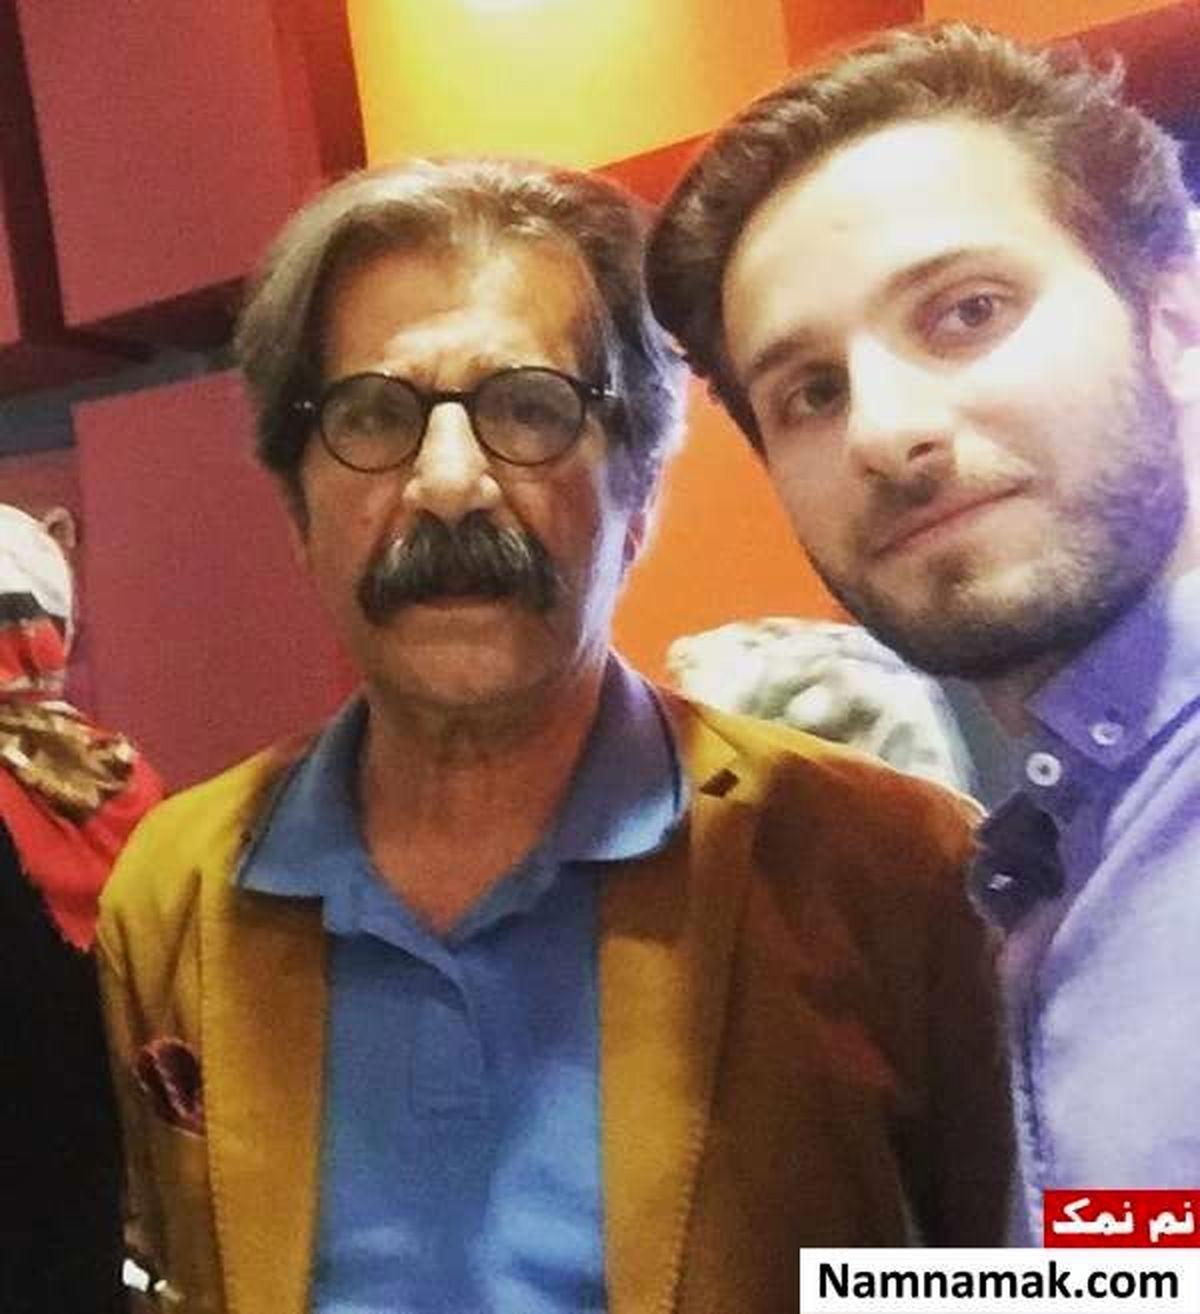 عزت الله مهرآوران در کنار پسرش + عکس